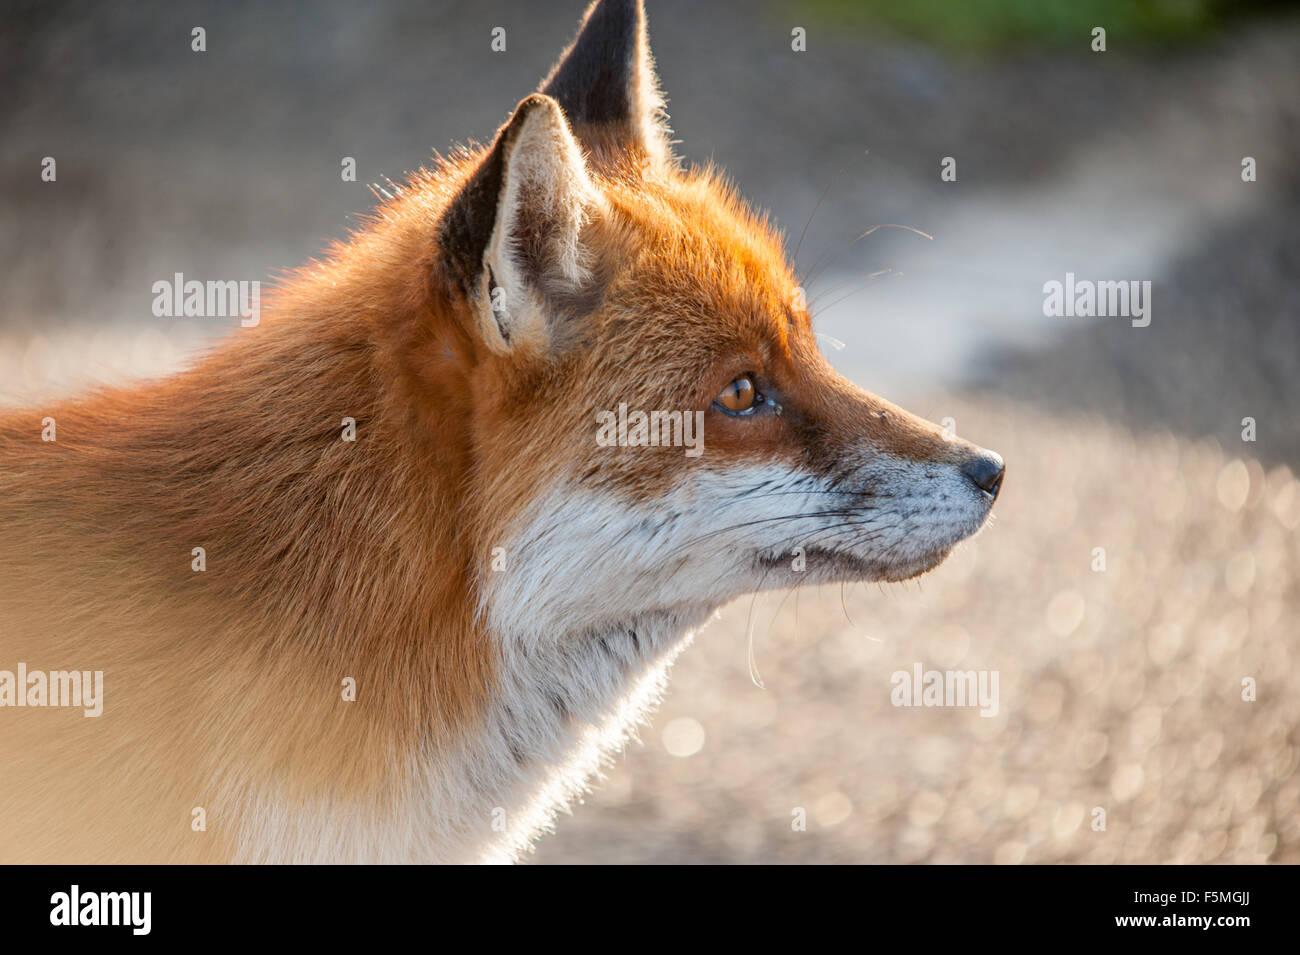 Fox Head Profile Stock Photo Alamy